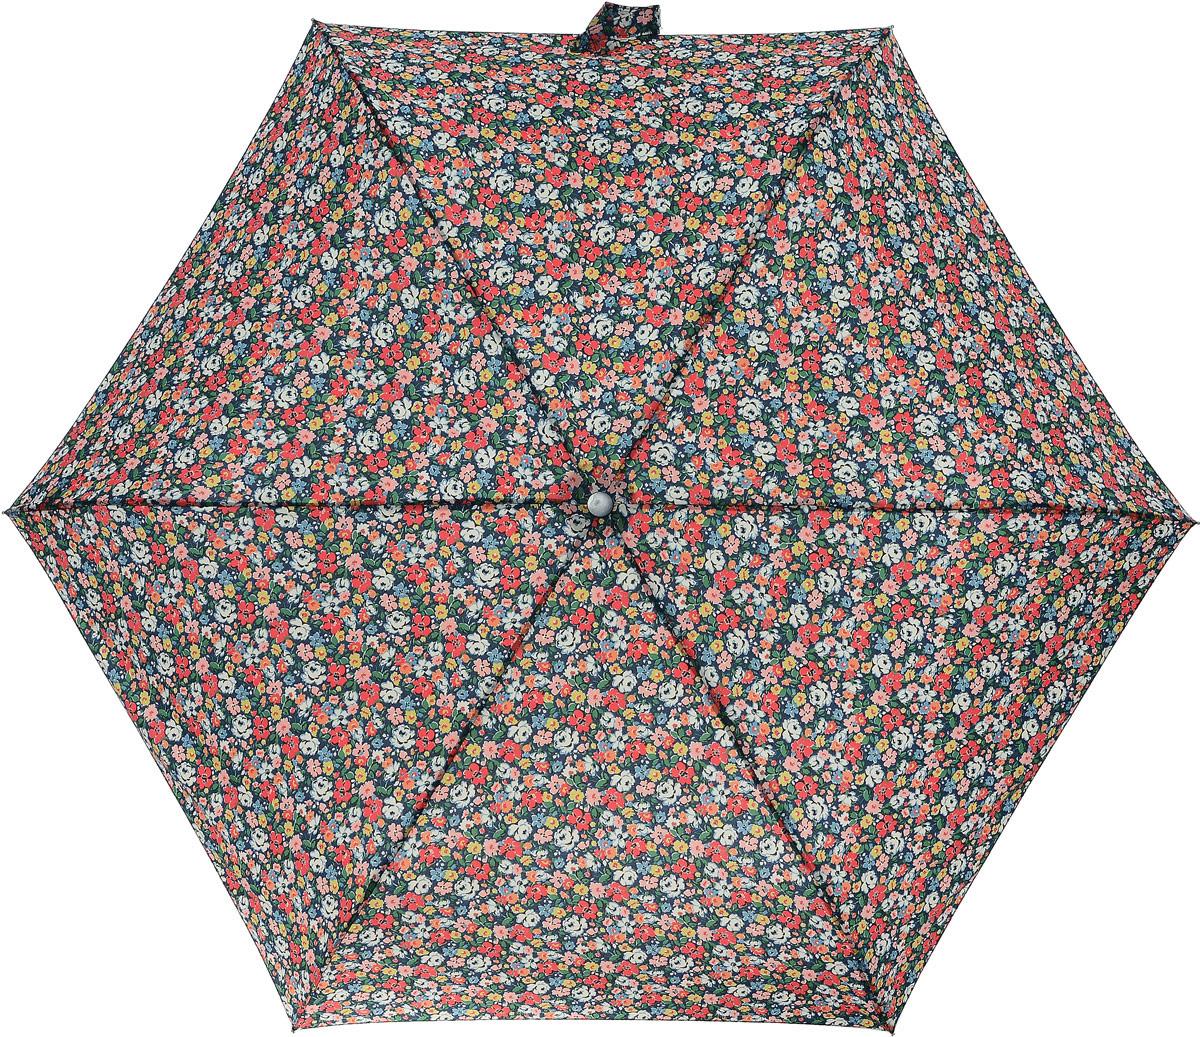 "Зонт женский Cath Kidston ""Minilite"", механический, 3 сложения, цвет: синий, мультиколор. L768-2853 L768-2853 MewsDitsyBlue"